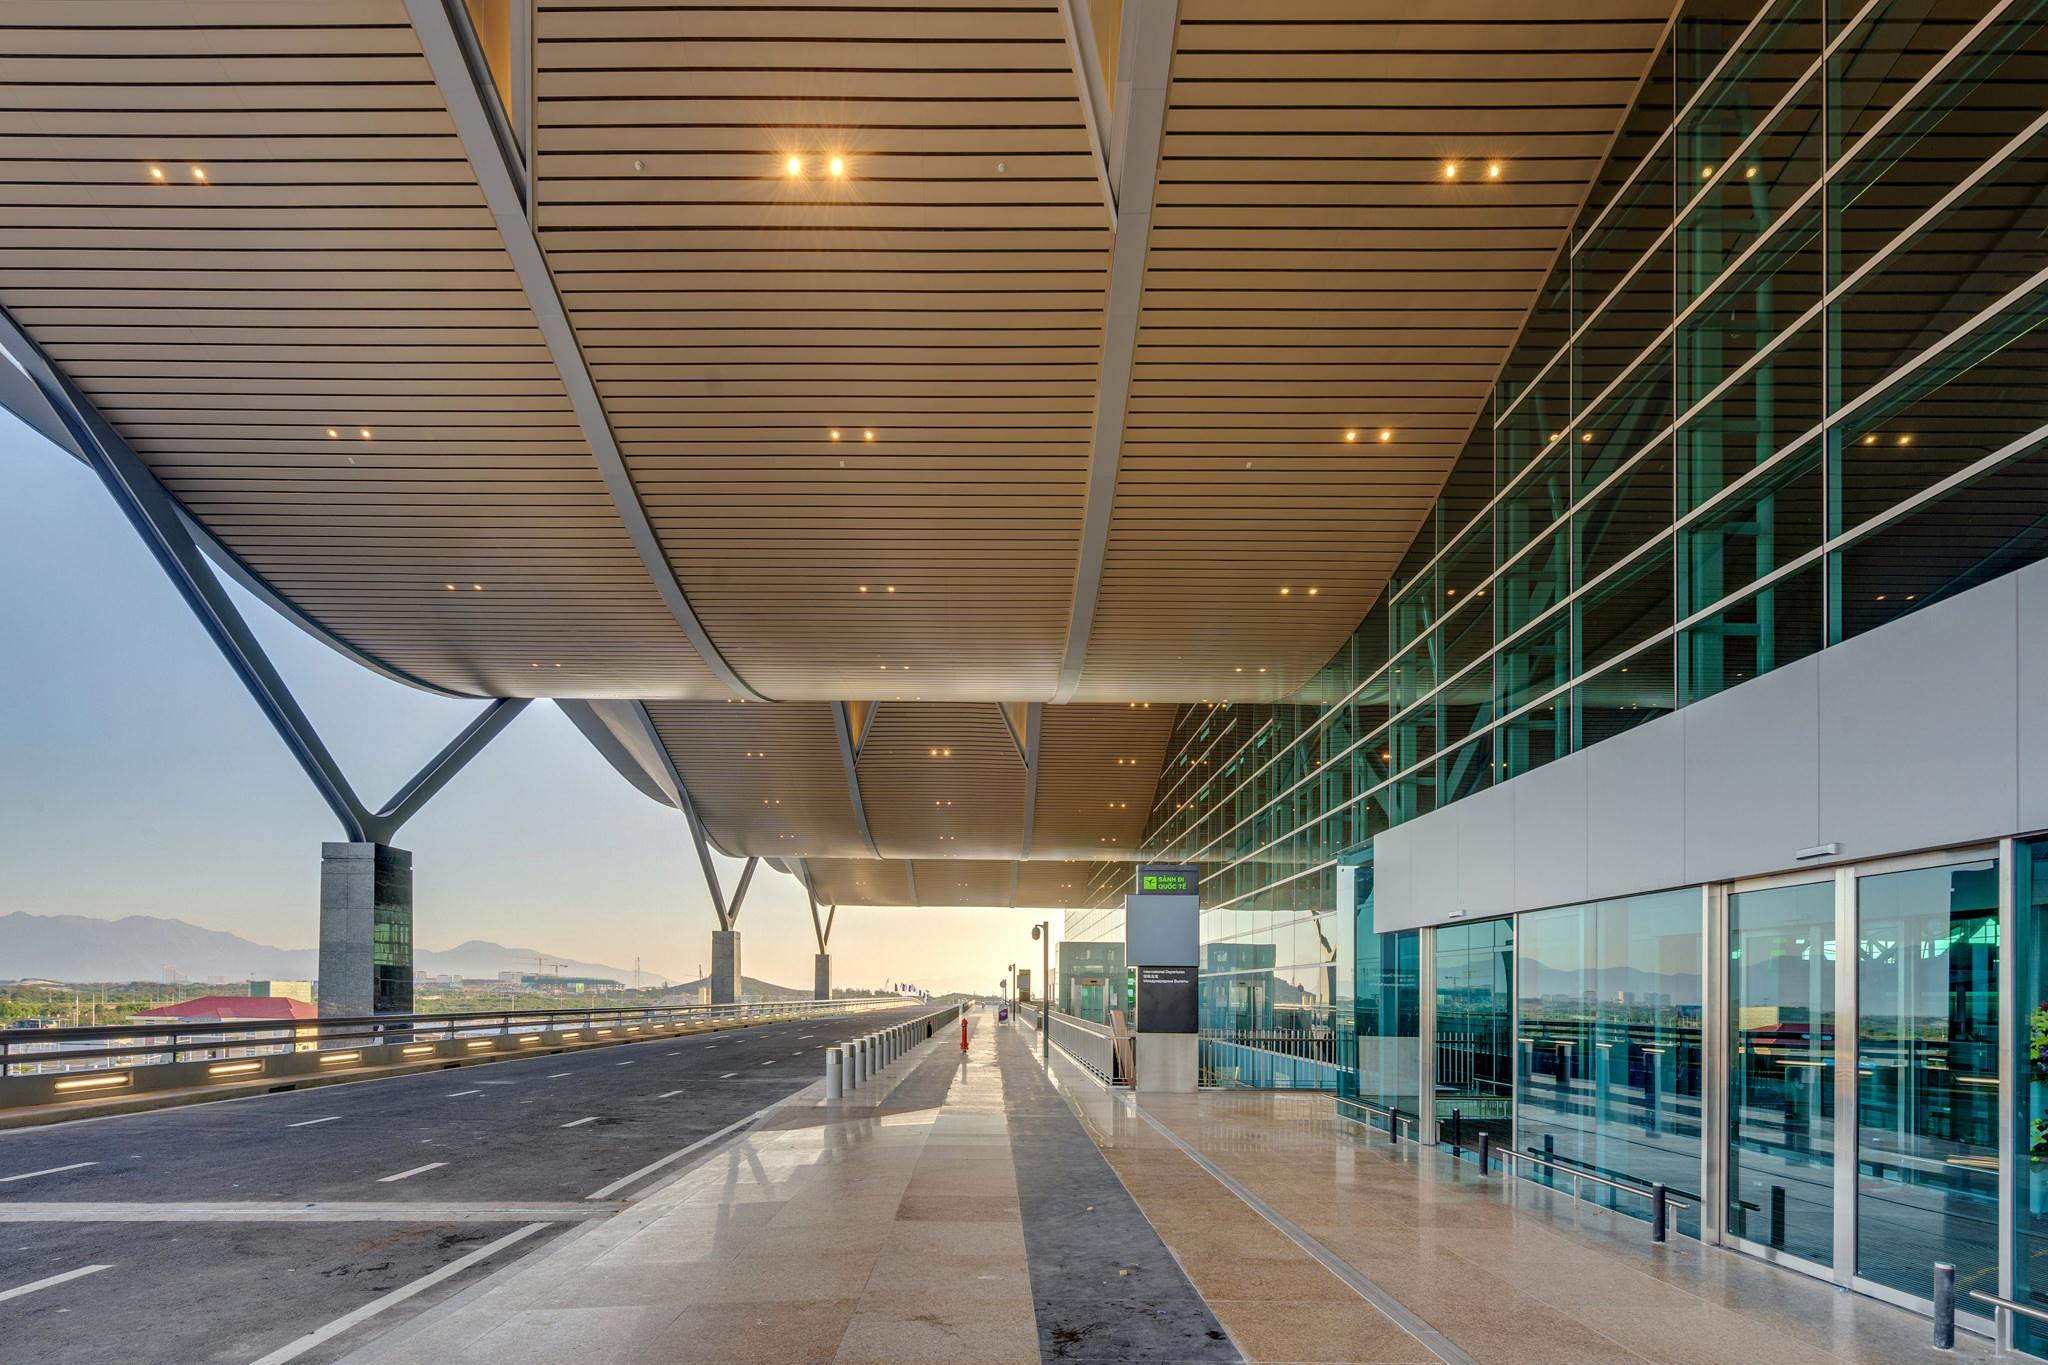 20180626 - Cam Ranh Airport - Architecture - 0071.jpg